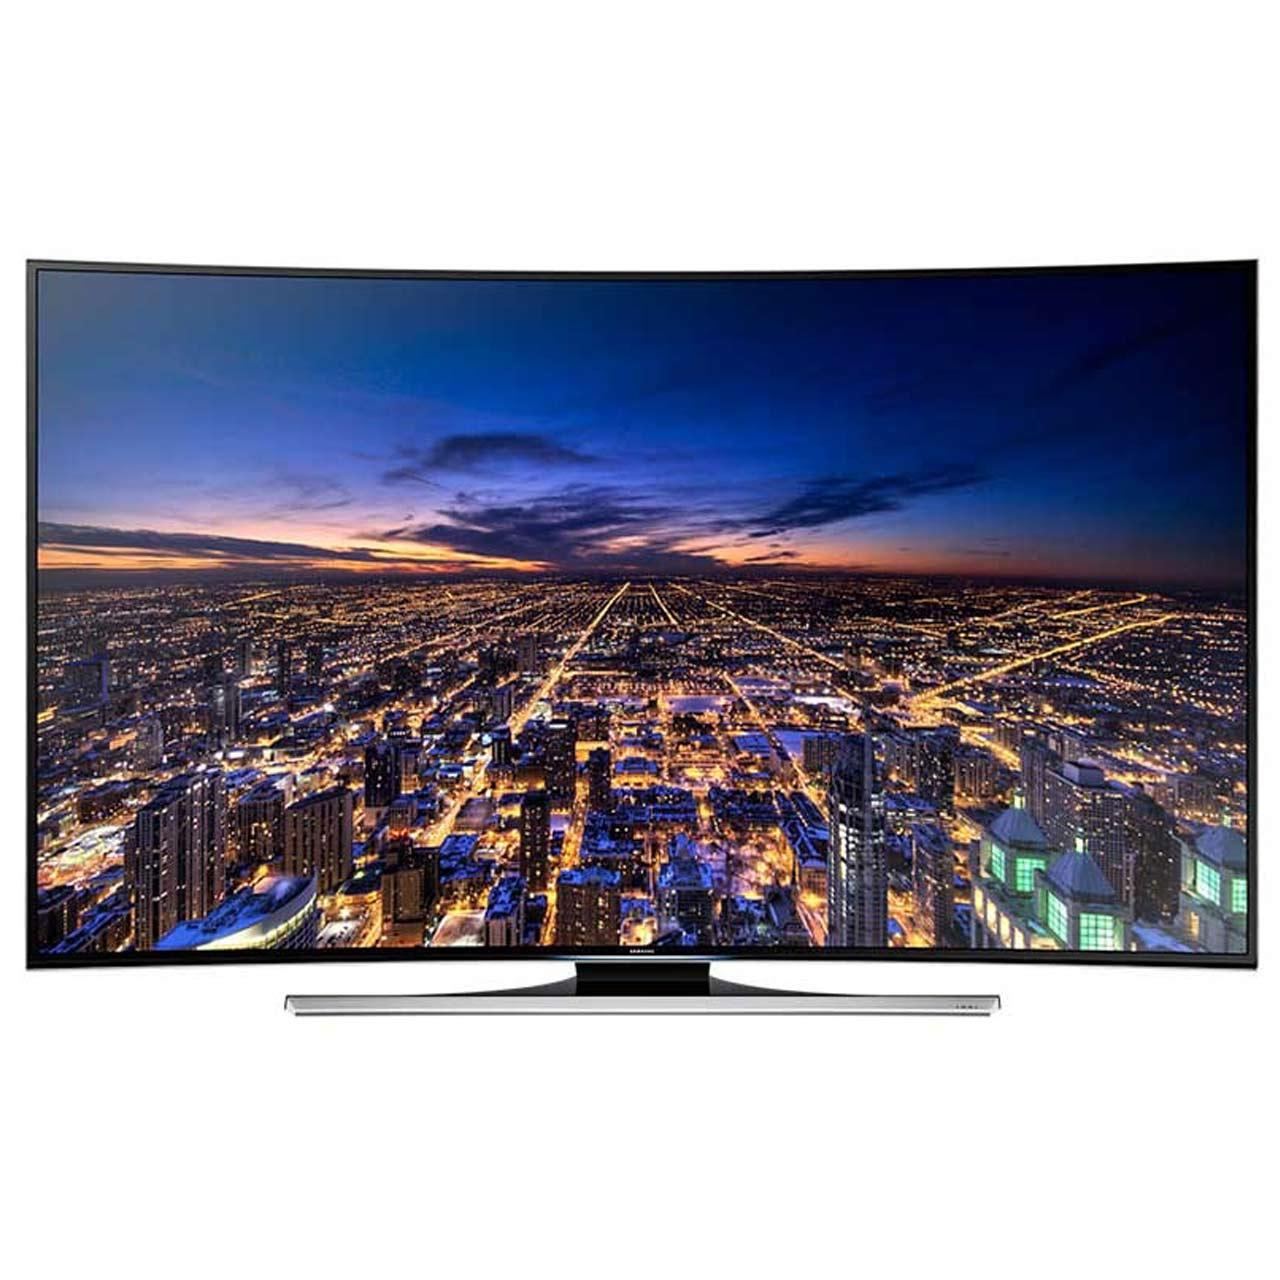 تلویزیون ال ای دی هوشمند خمیده سامسونگ مدل 55HUC8990 سایز 55 اینچ | Samsung 55HUC8990 Curved Smart LED TV 55 Inch